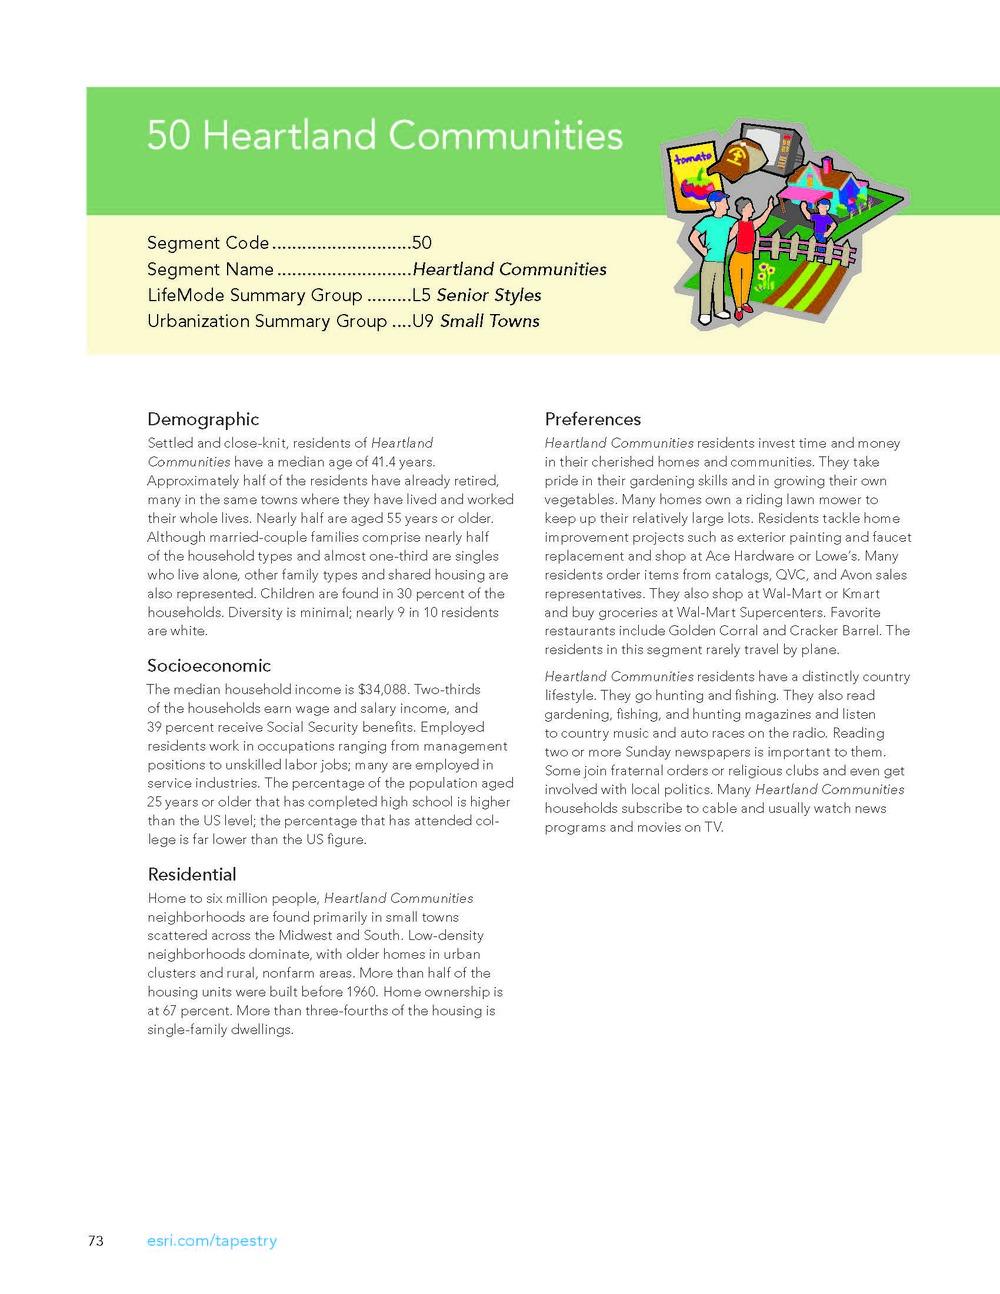 tapestry-segmentation_Page_76.jpg